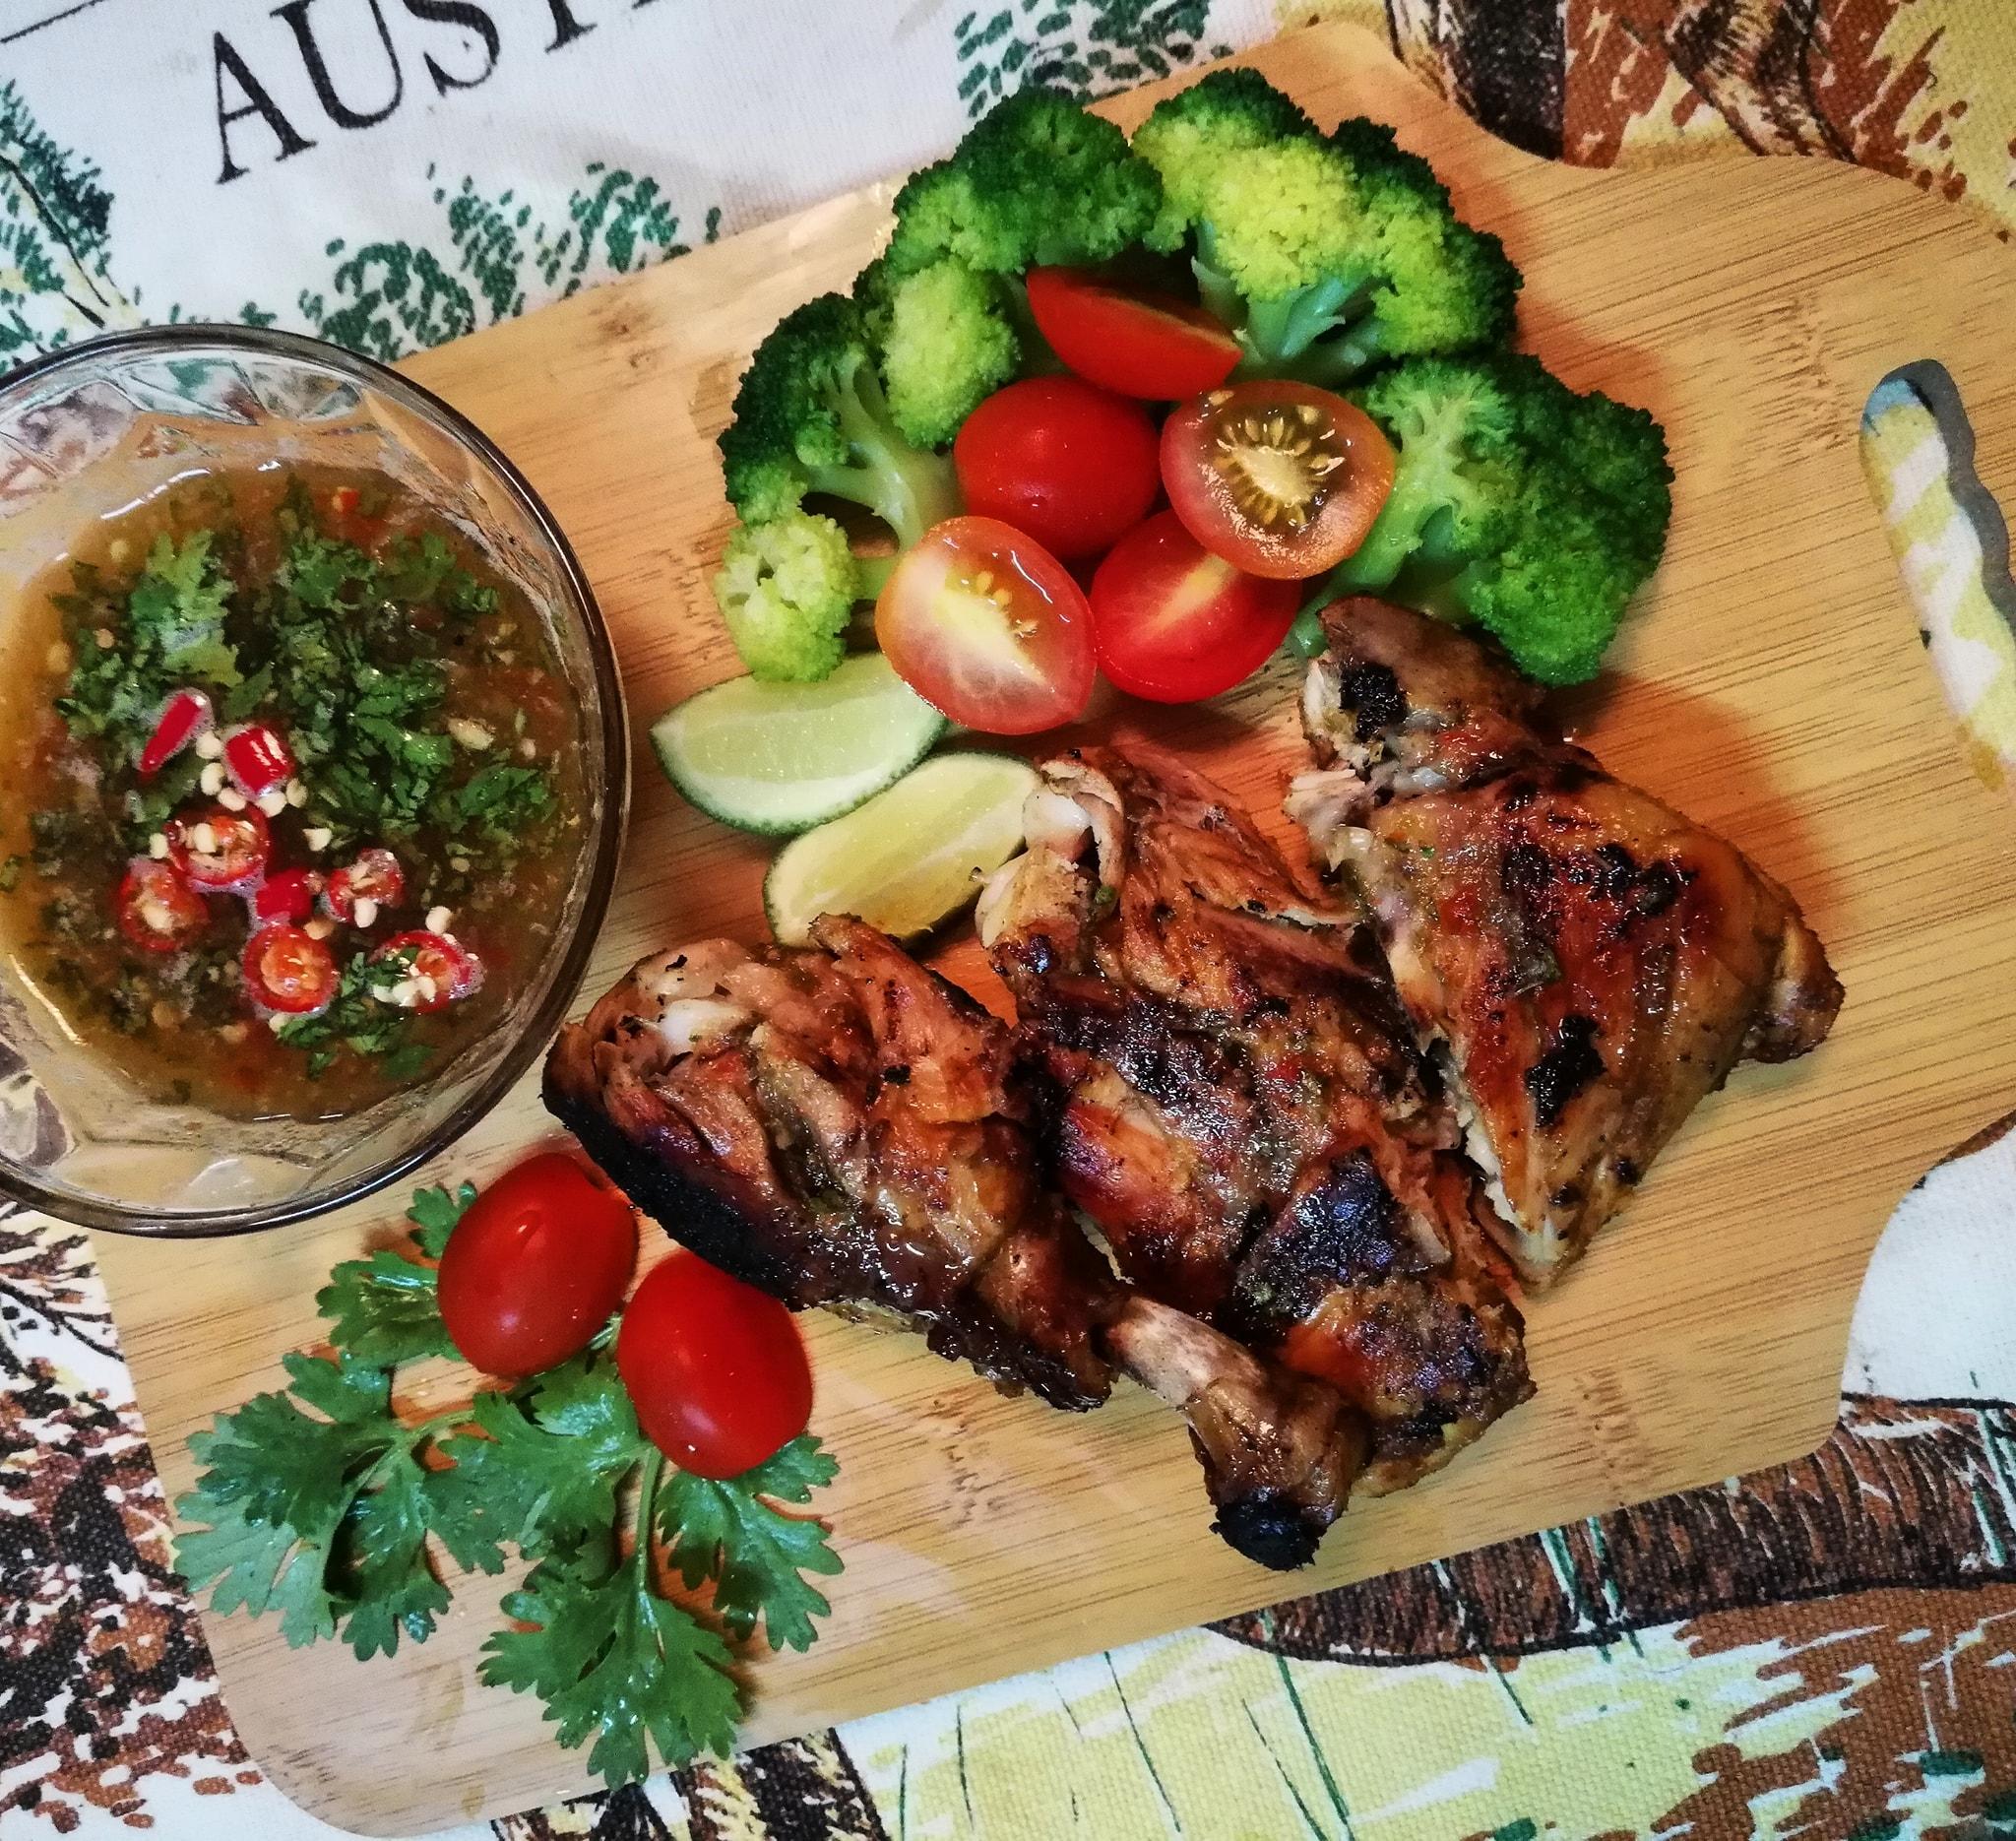 resepi ayam bakar meraung  tersangat sedap tengok gambar pun dah terliur  resepi Resepi Ayam Goreng Sedap Enak dan Mudah